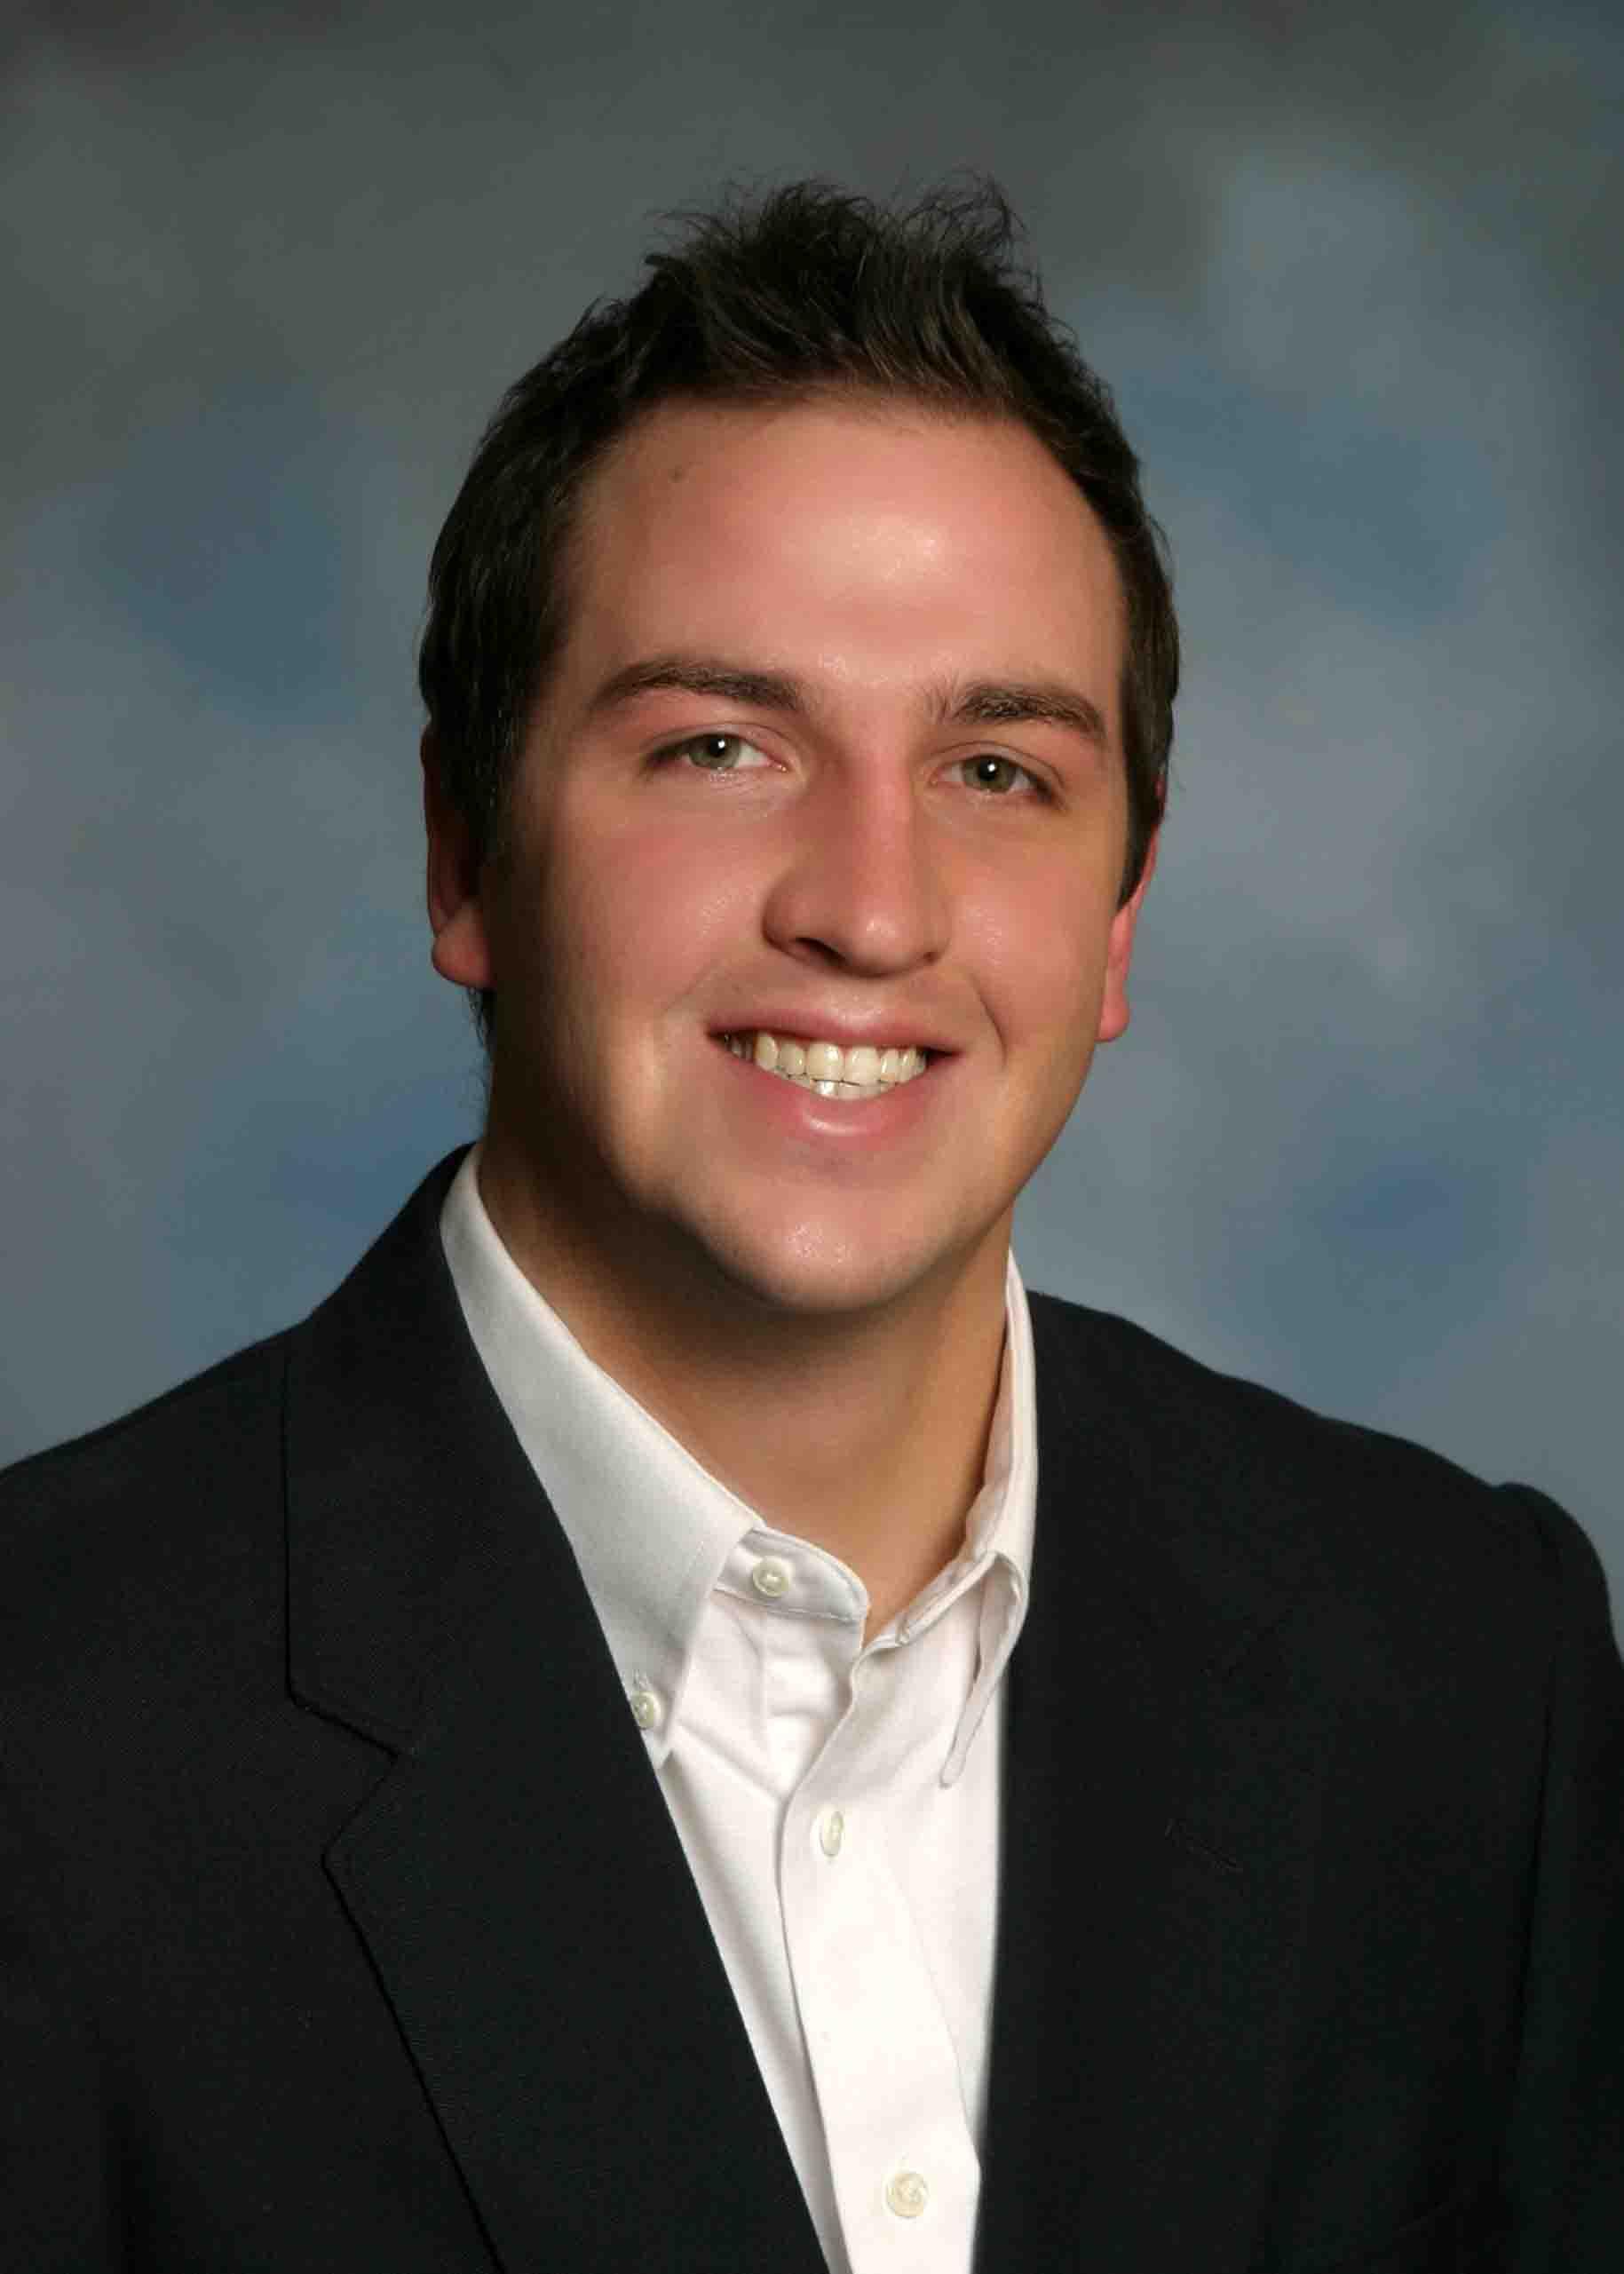 Matthew Karns